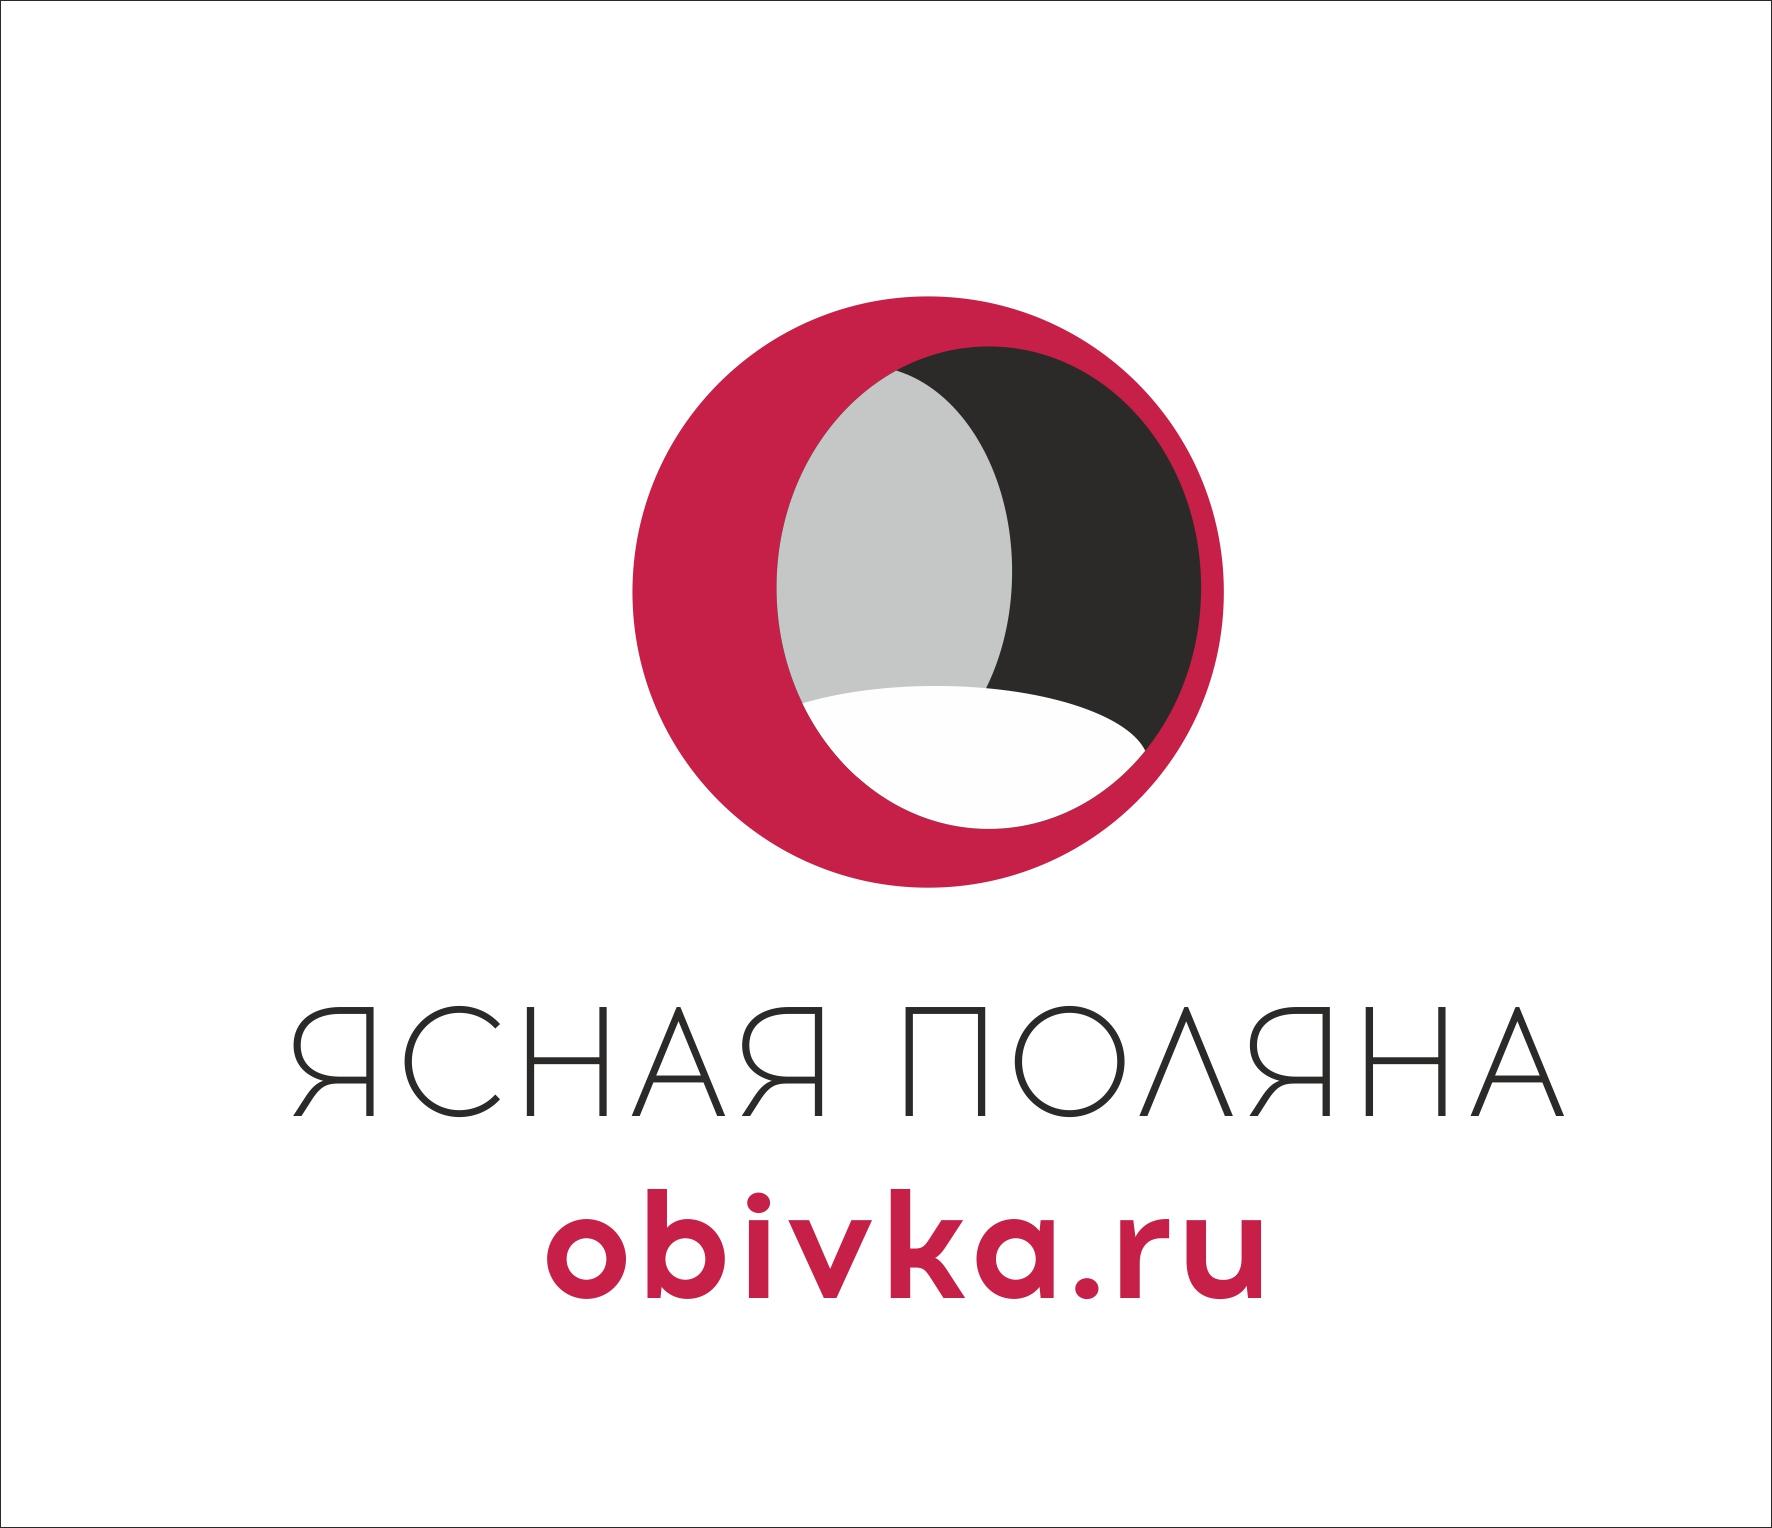 Логотип для сайта OBIVKA.RU фото f_3215c1fc83c3fecd.jpg